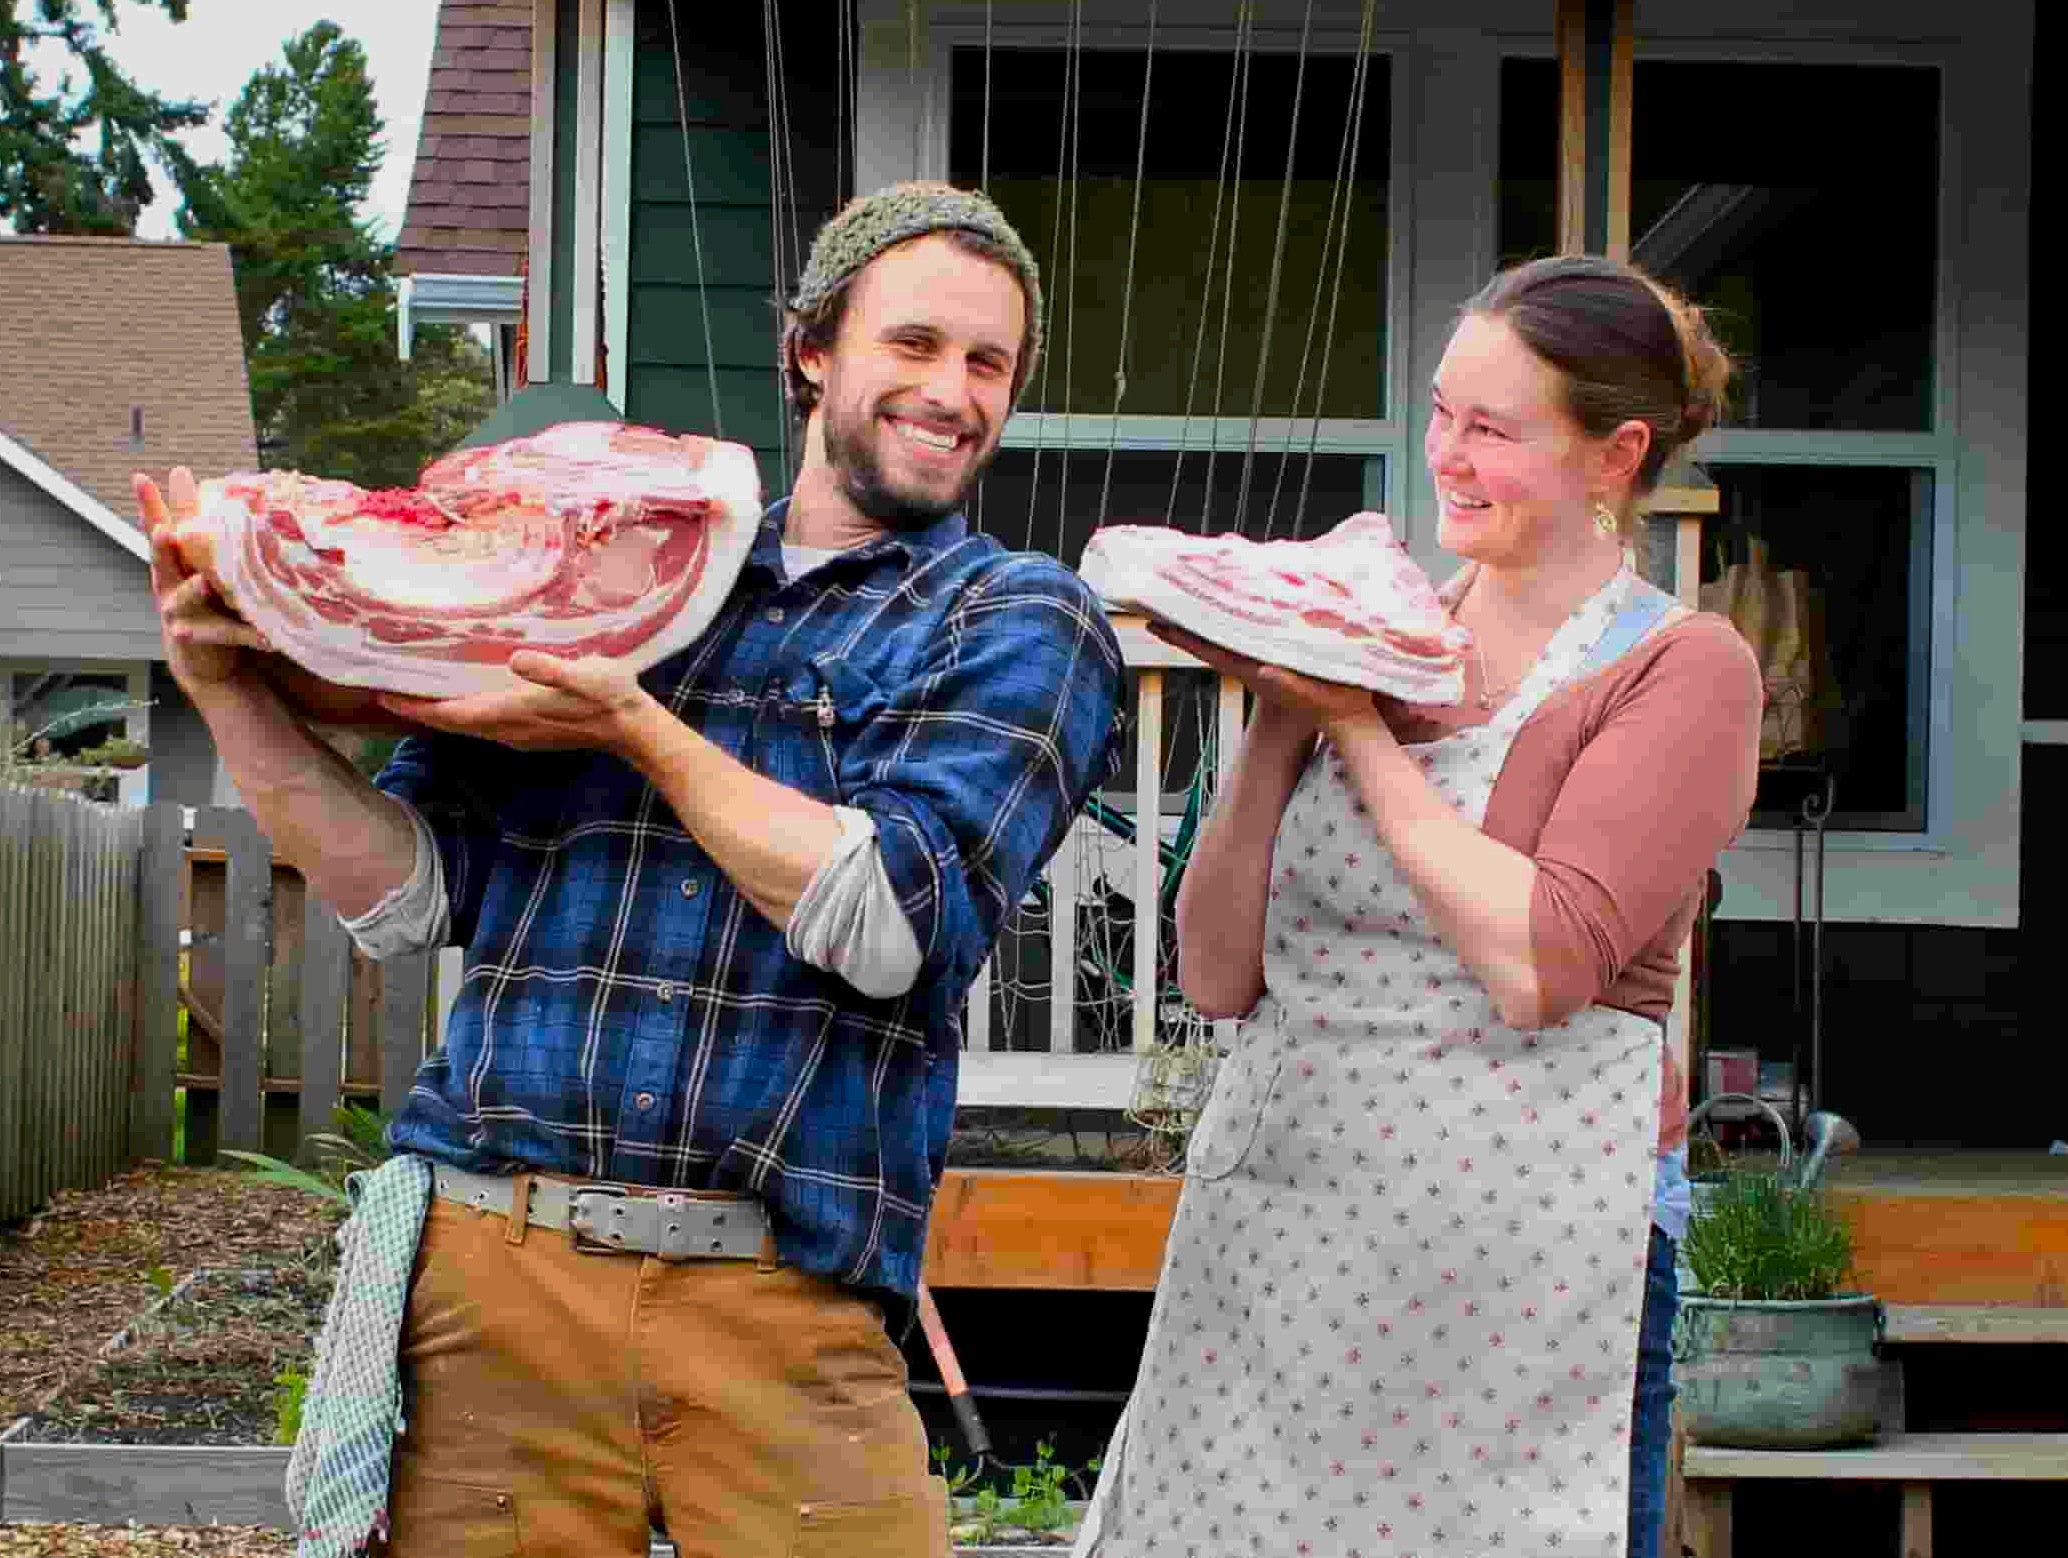 Brandon Sheard with pork belly